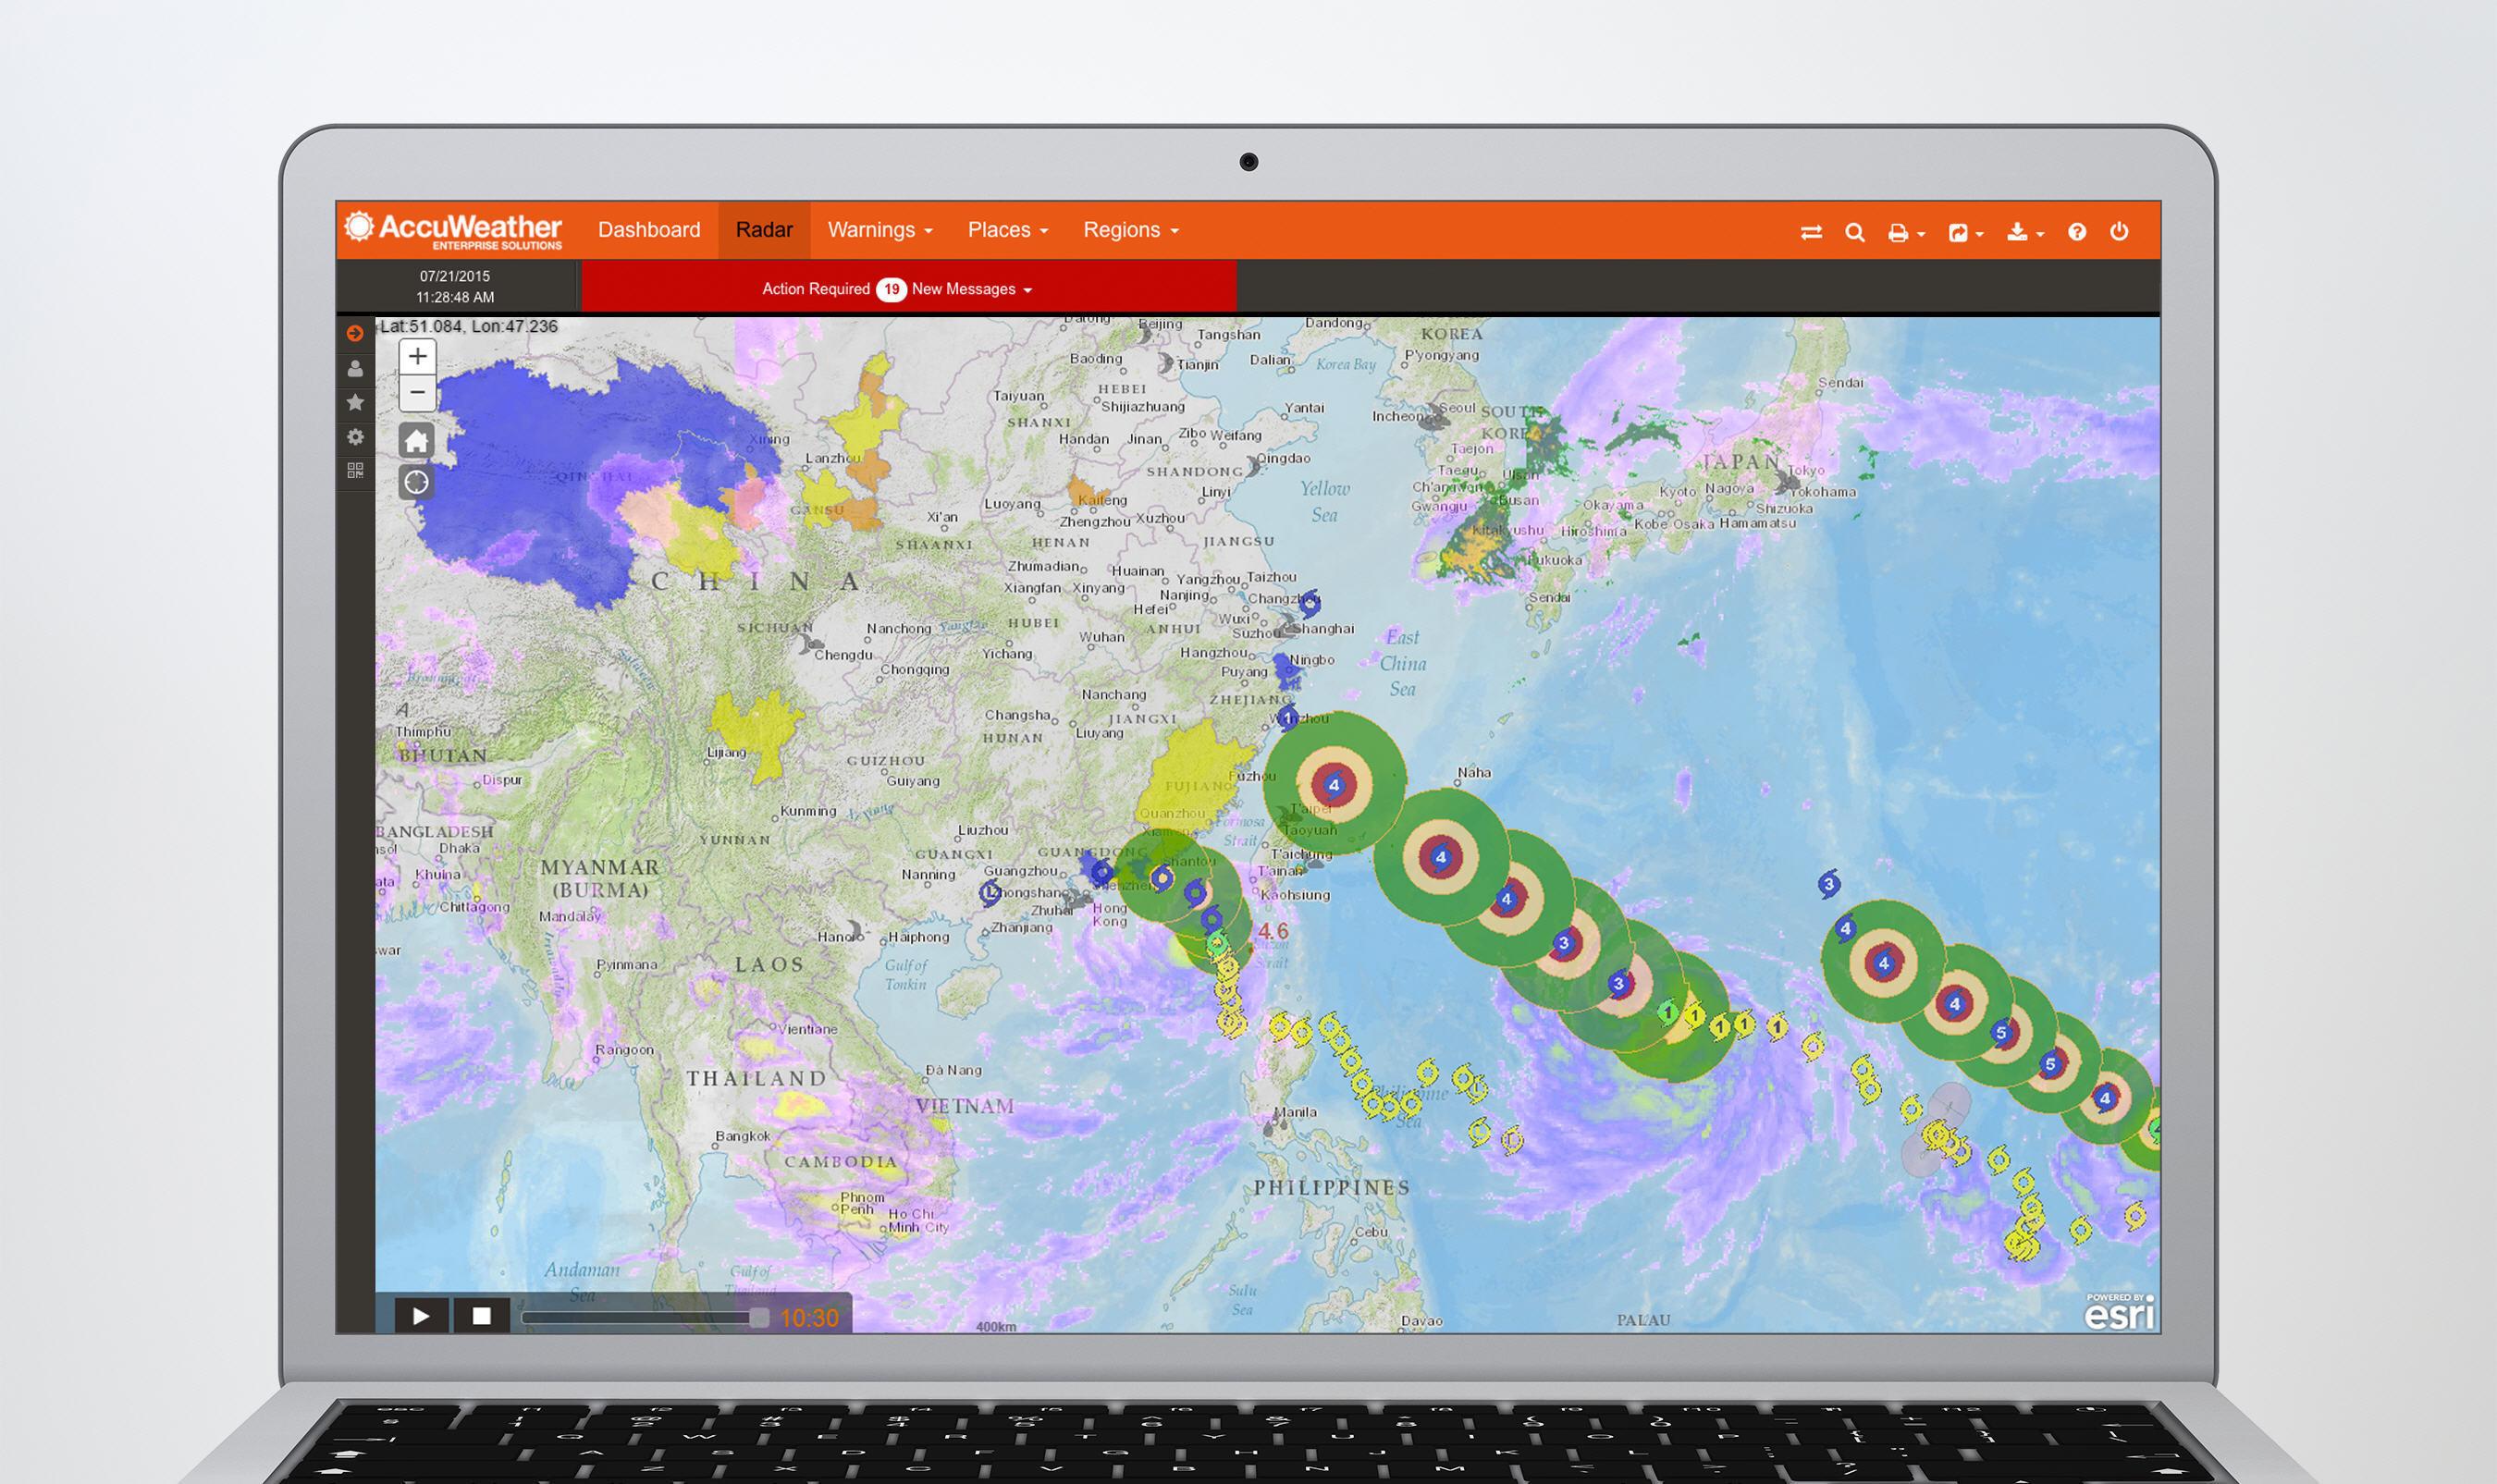 AccuWeather Enterprise Services portal delivery system